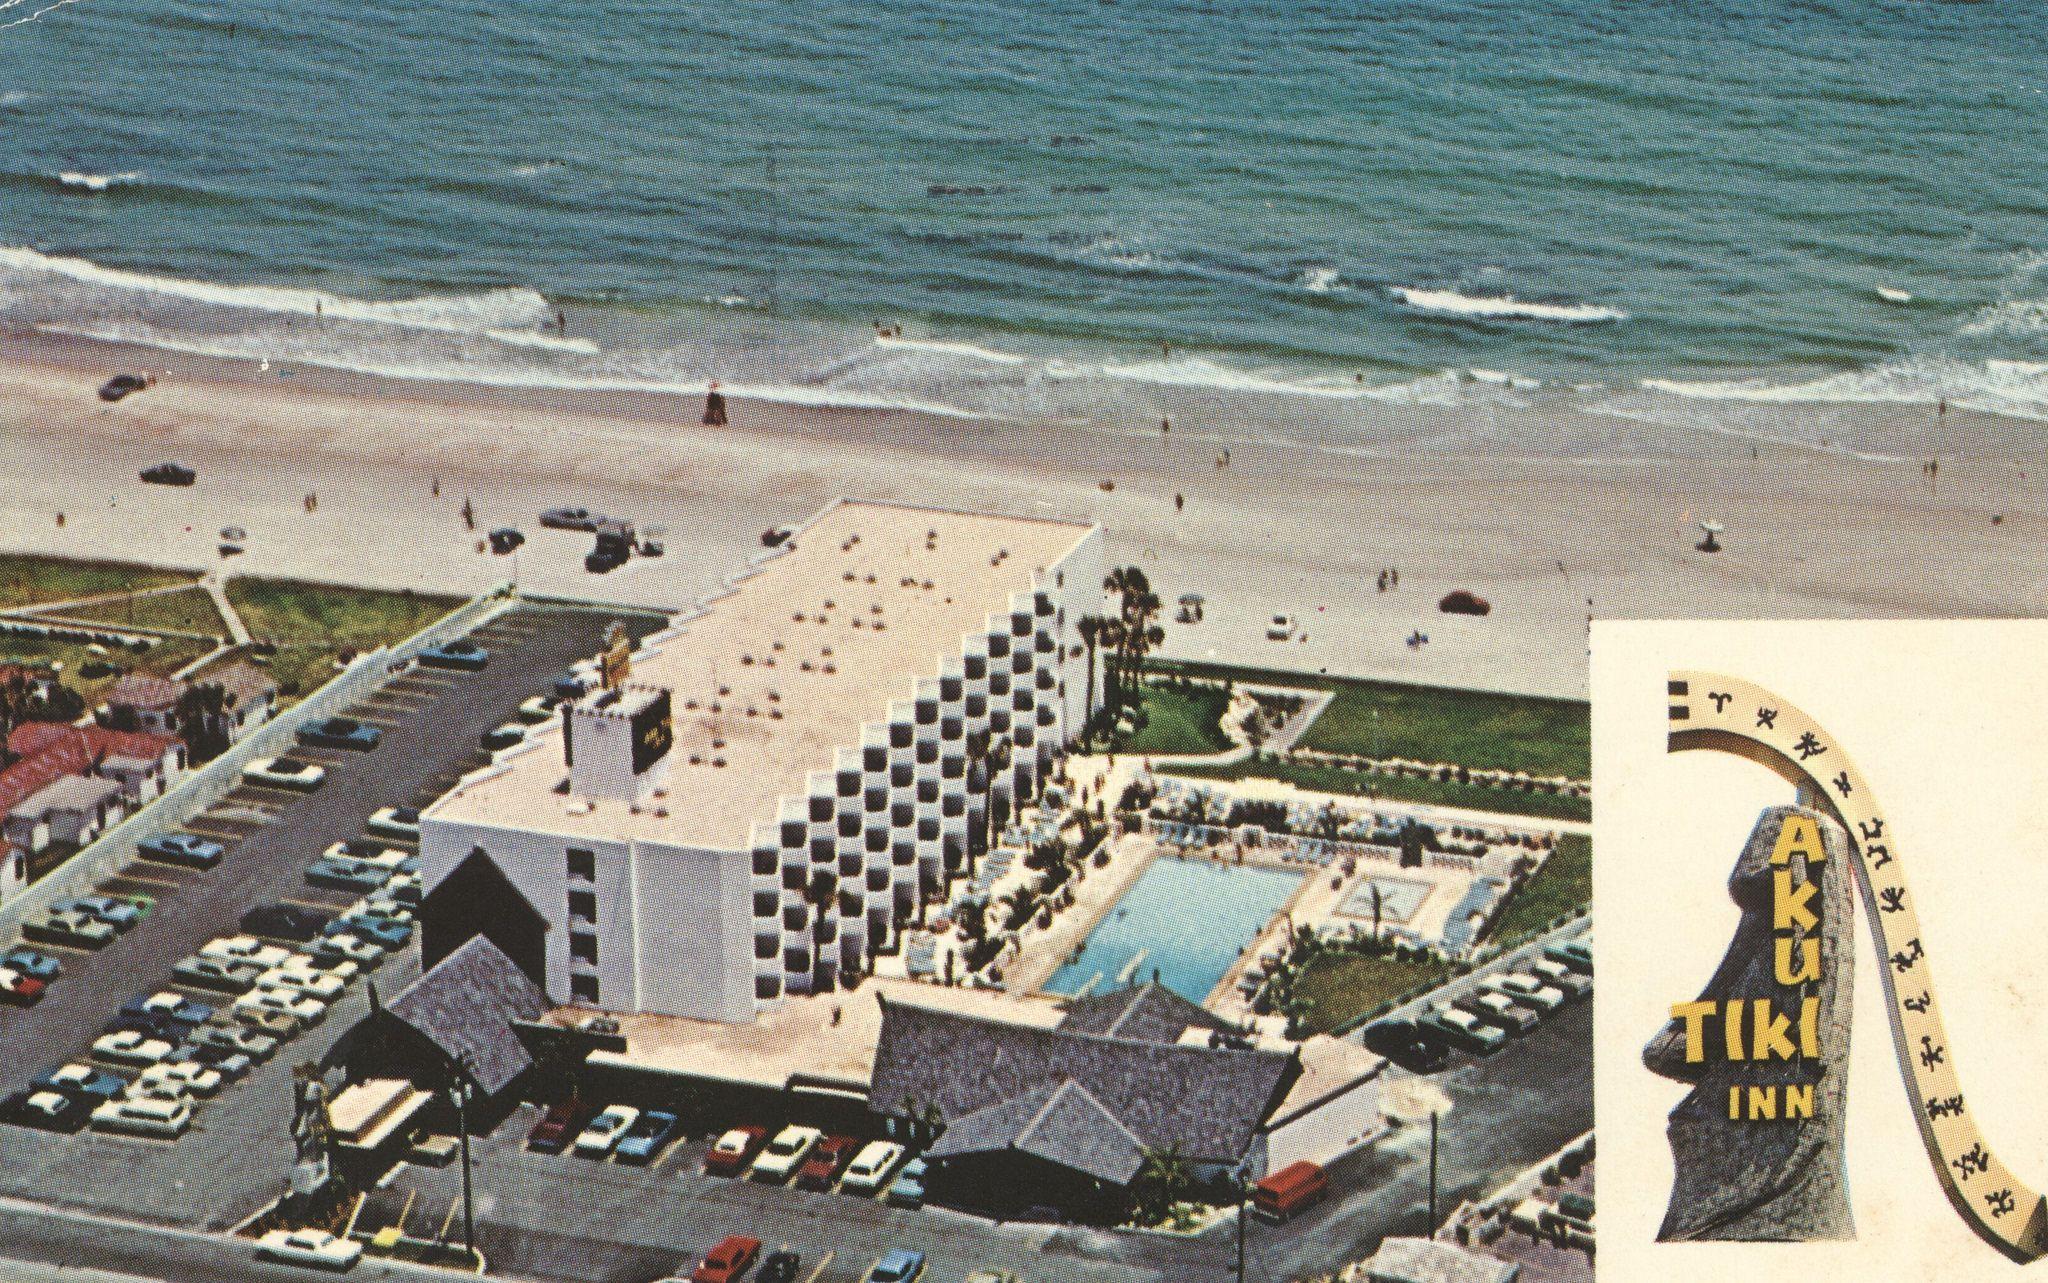 Aku Tiki Inn Daytona Beach Shores, Florida (With images)